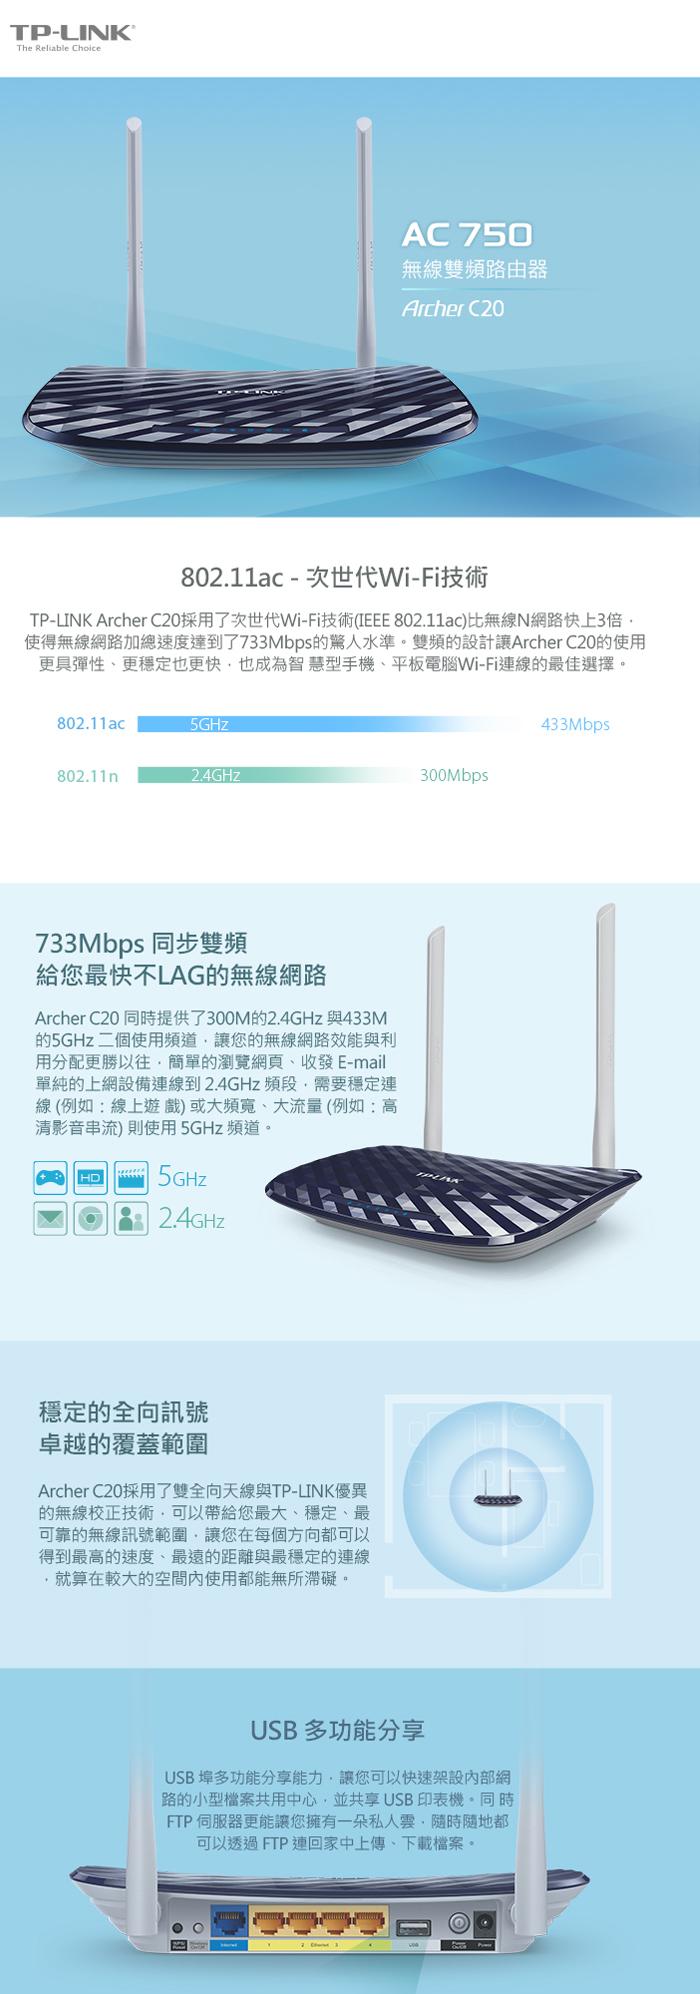 TP-LINK ARCHER C20(TW) AC750無線雙頻路由器【風和網通】